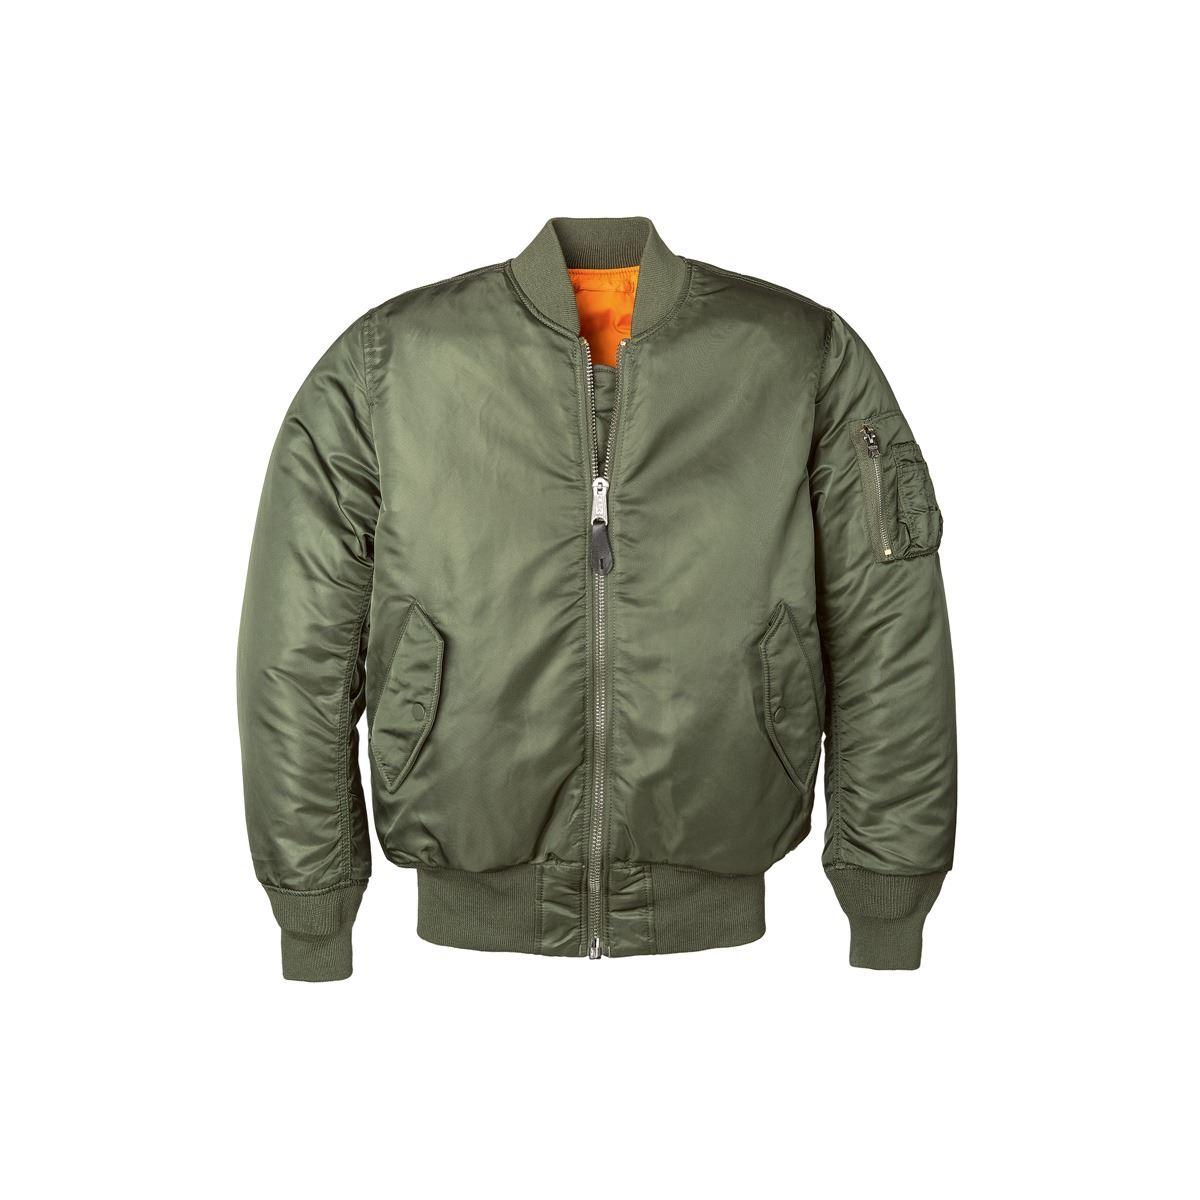 Fine Jacket Inc. MA-1 W Flight Jacket | Alpha Industries